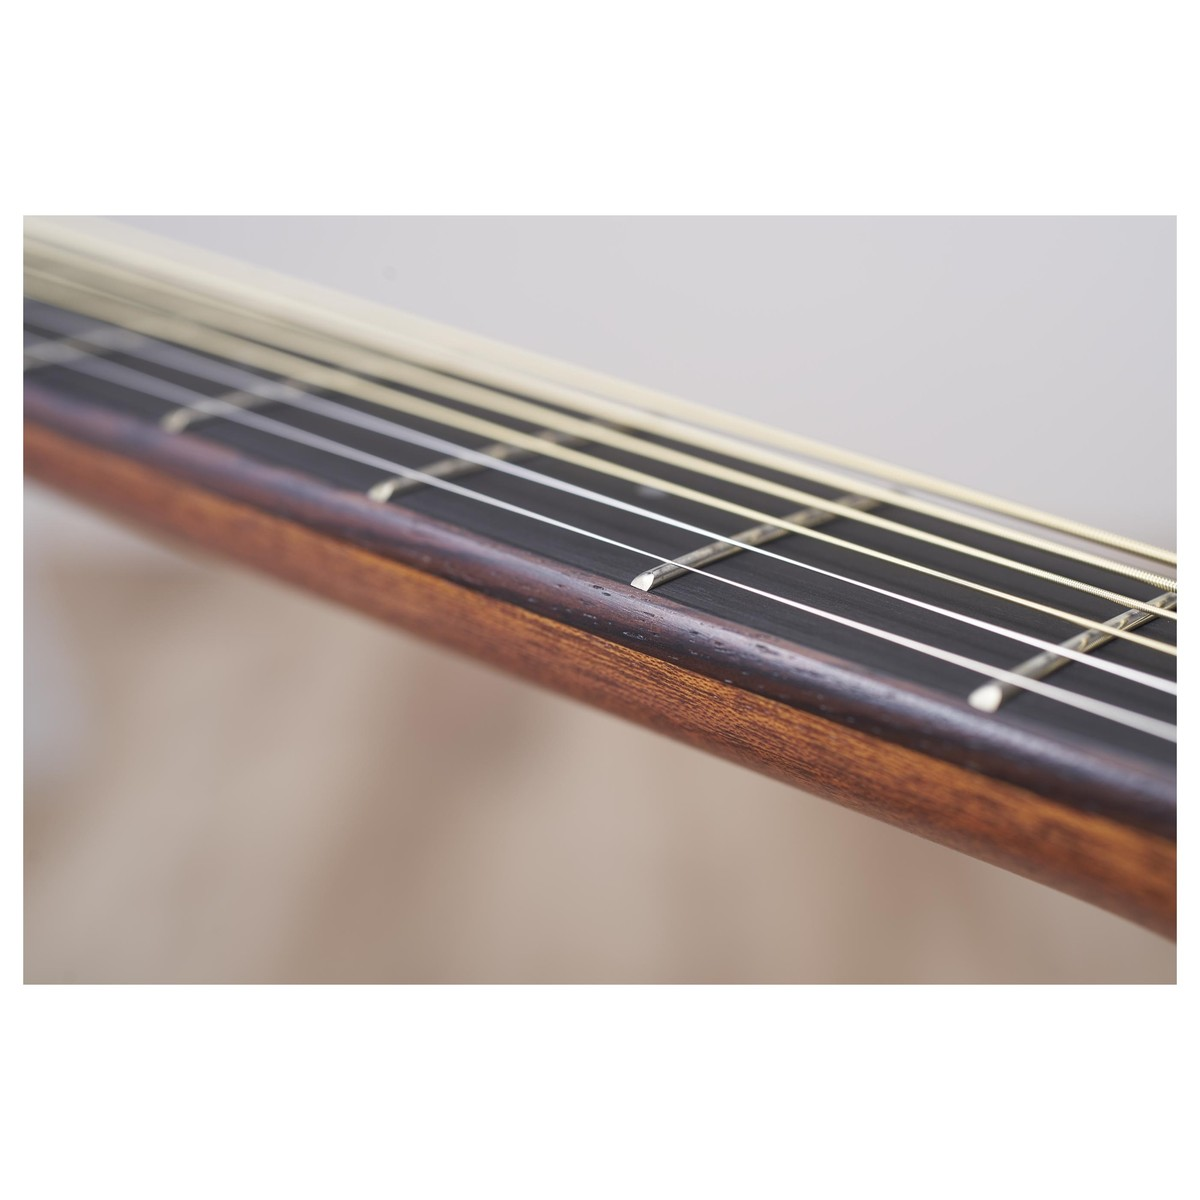 Yamaha a5r palo electro ac stico guitarra vintage natural for Yamaha a5r are